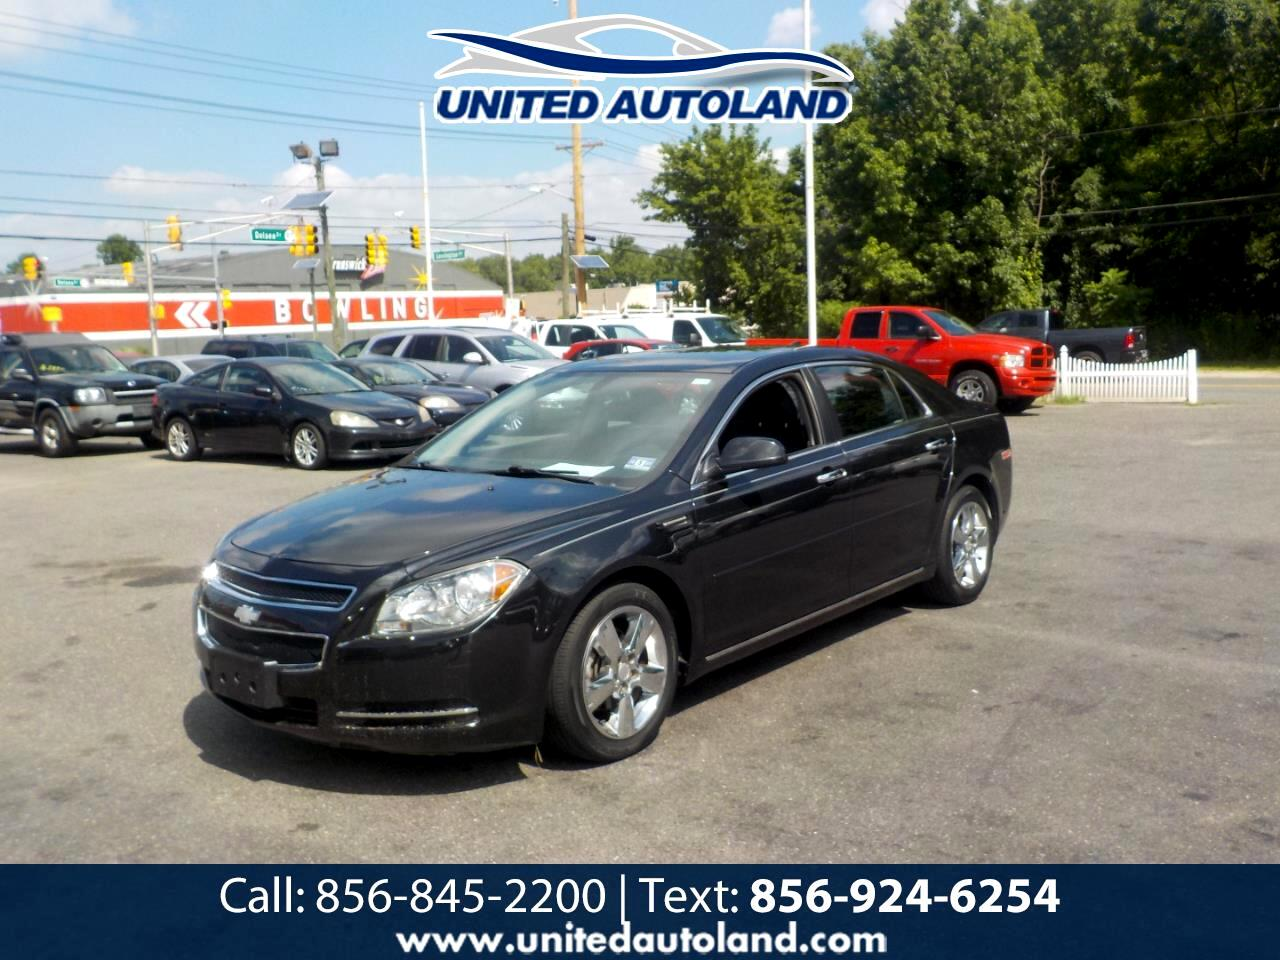 Used Cars for Sale Deptford NJ 08096 United Auto Land